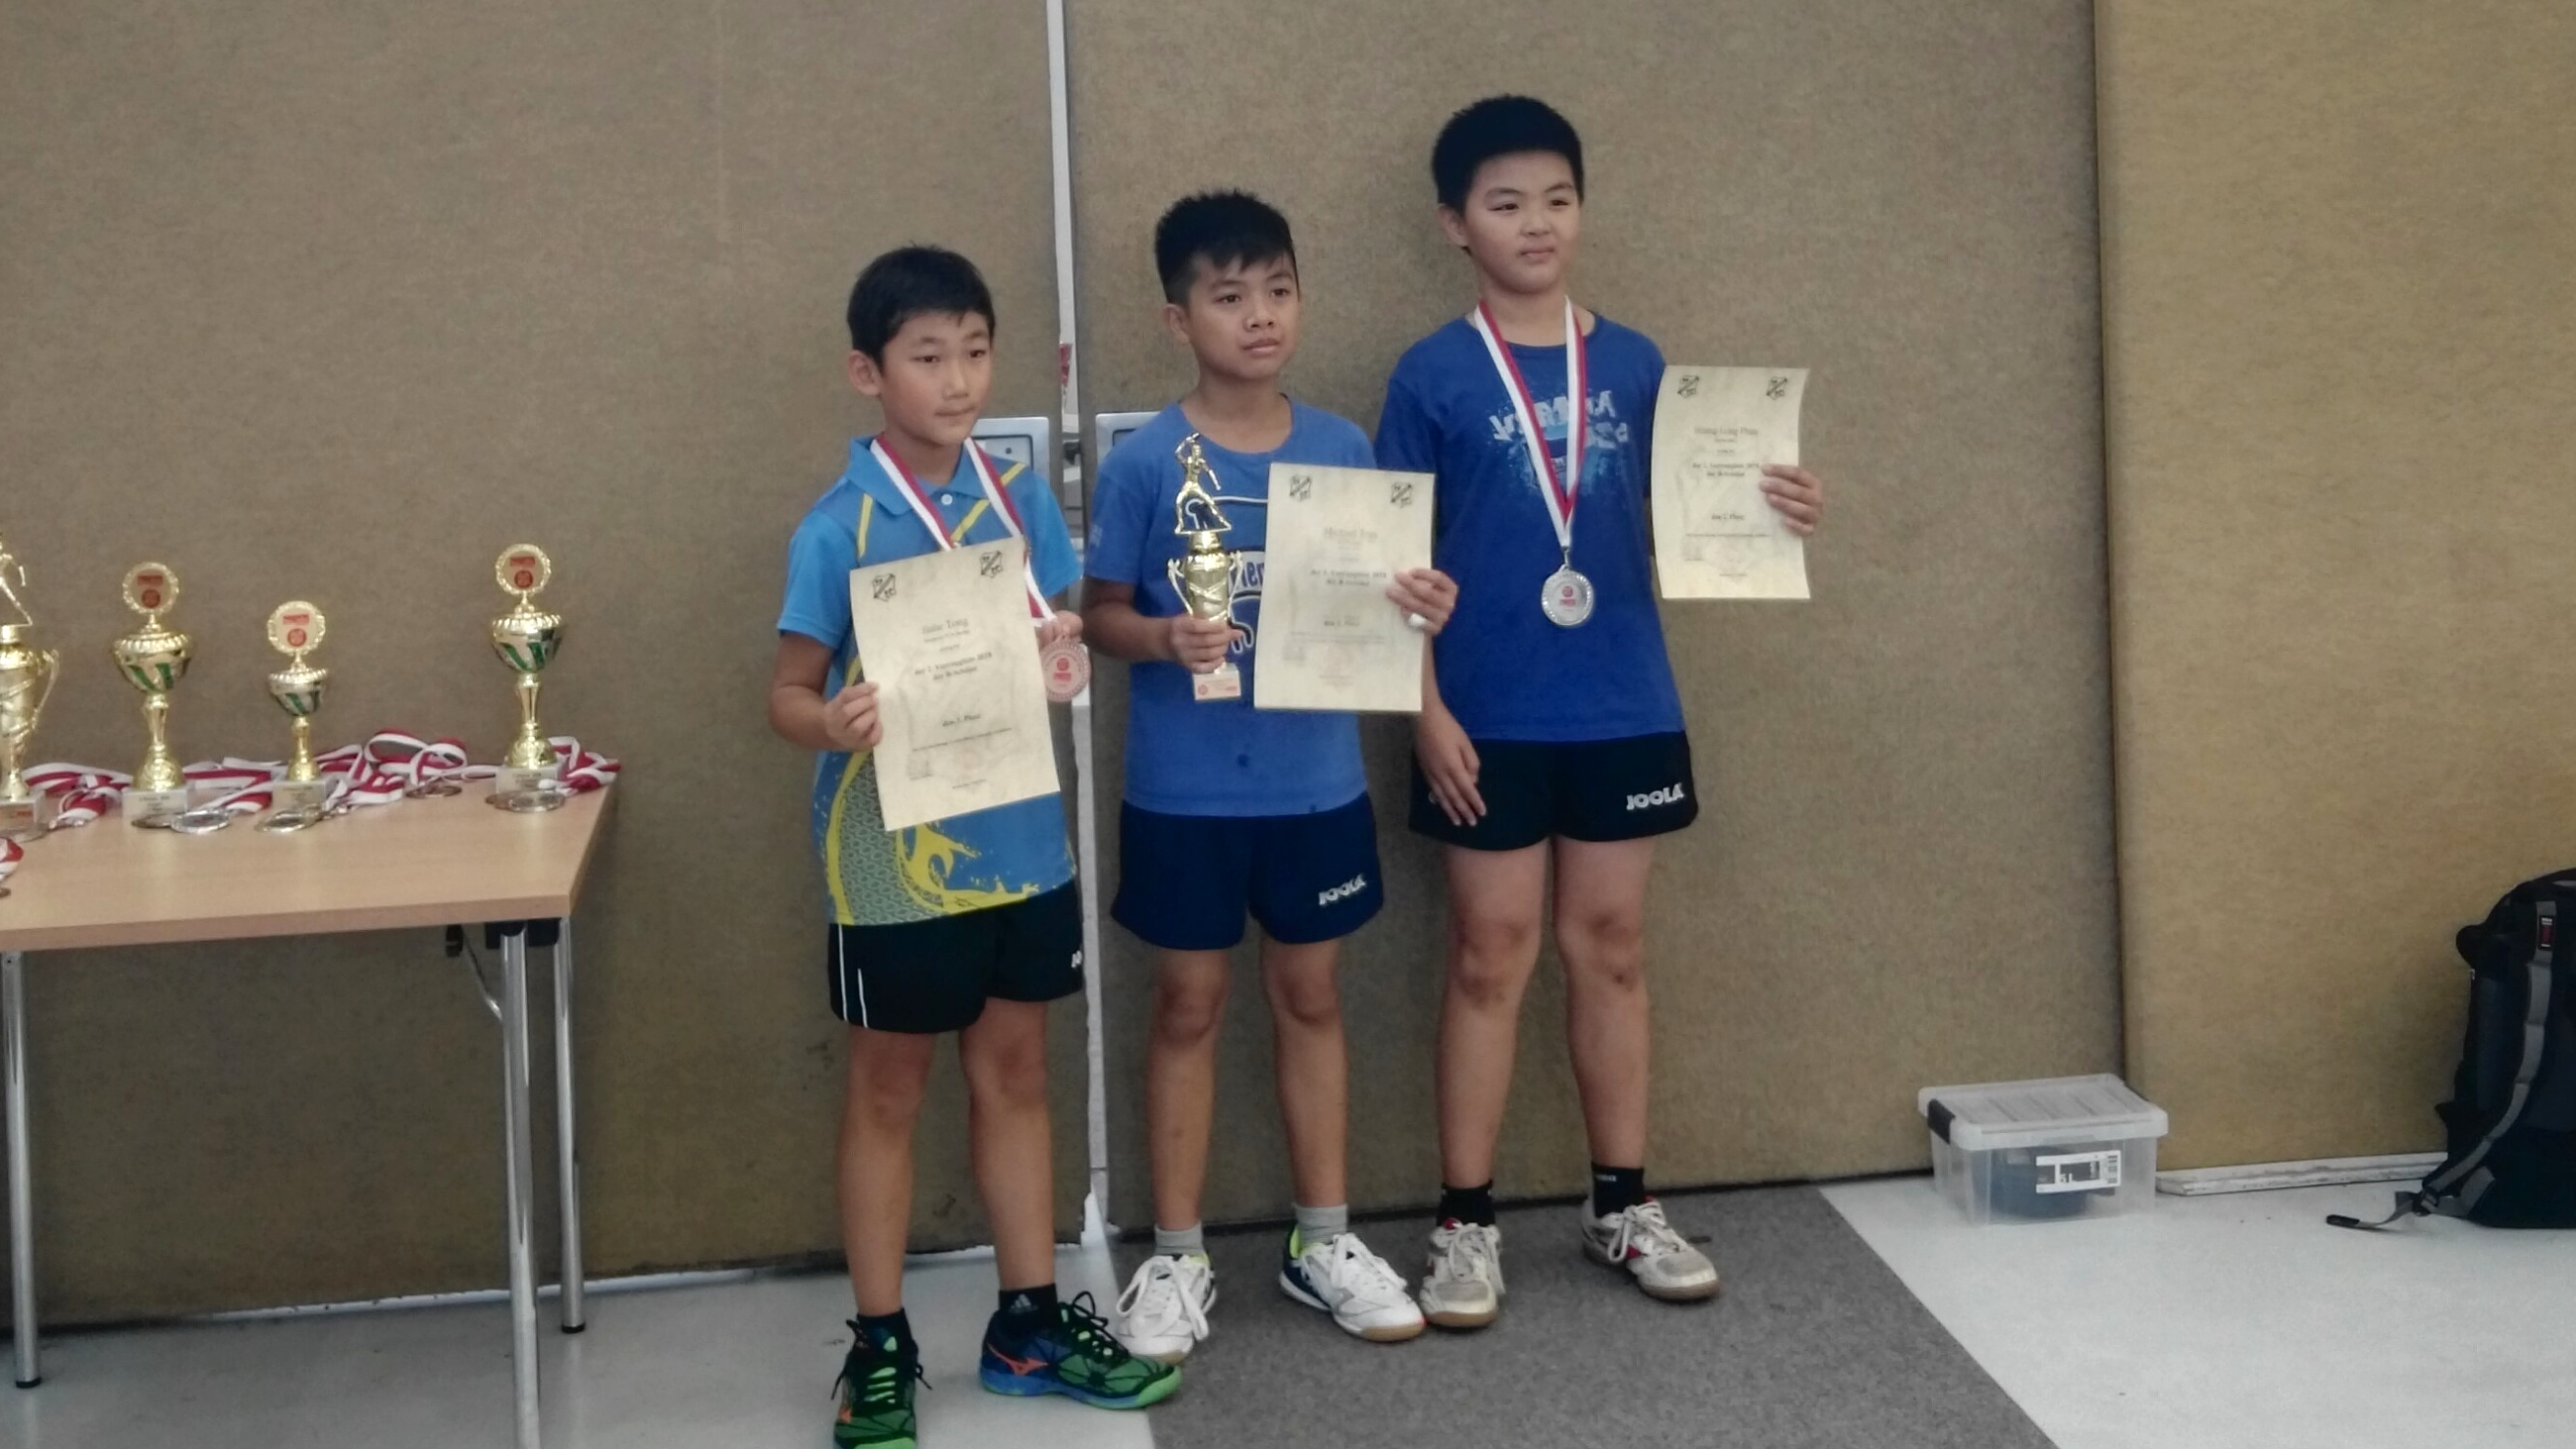 Siegerehrung Vorrangliste (1. Klasse) der B-Schüler: Jiahe (links) holt Bronze (Foto: Y. Tong)